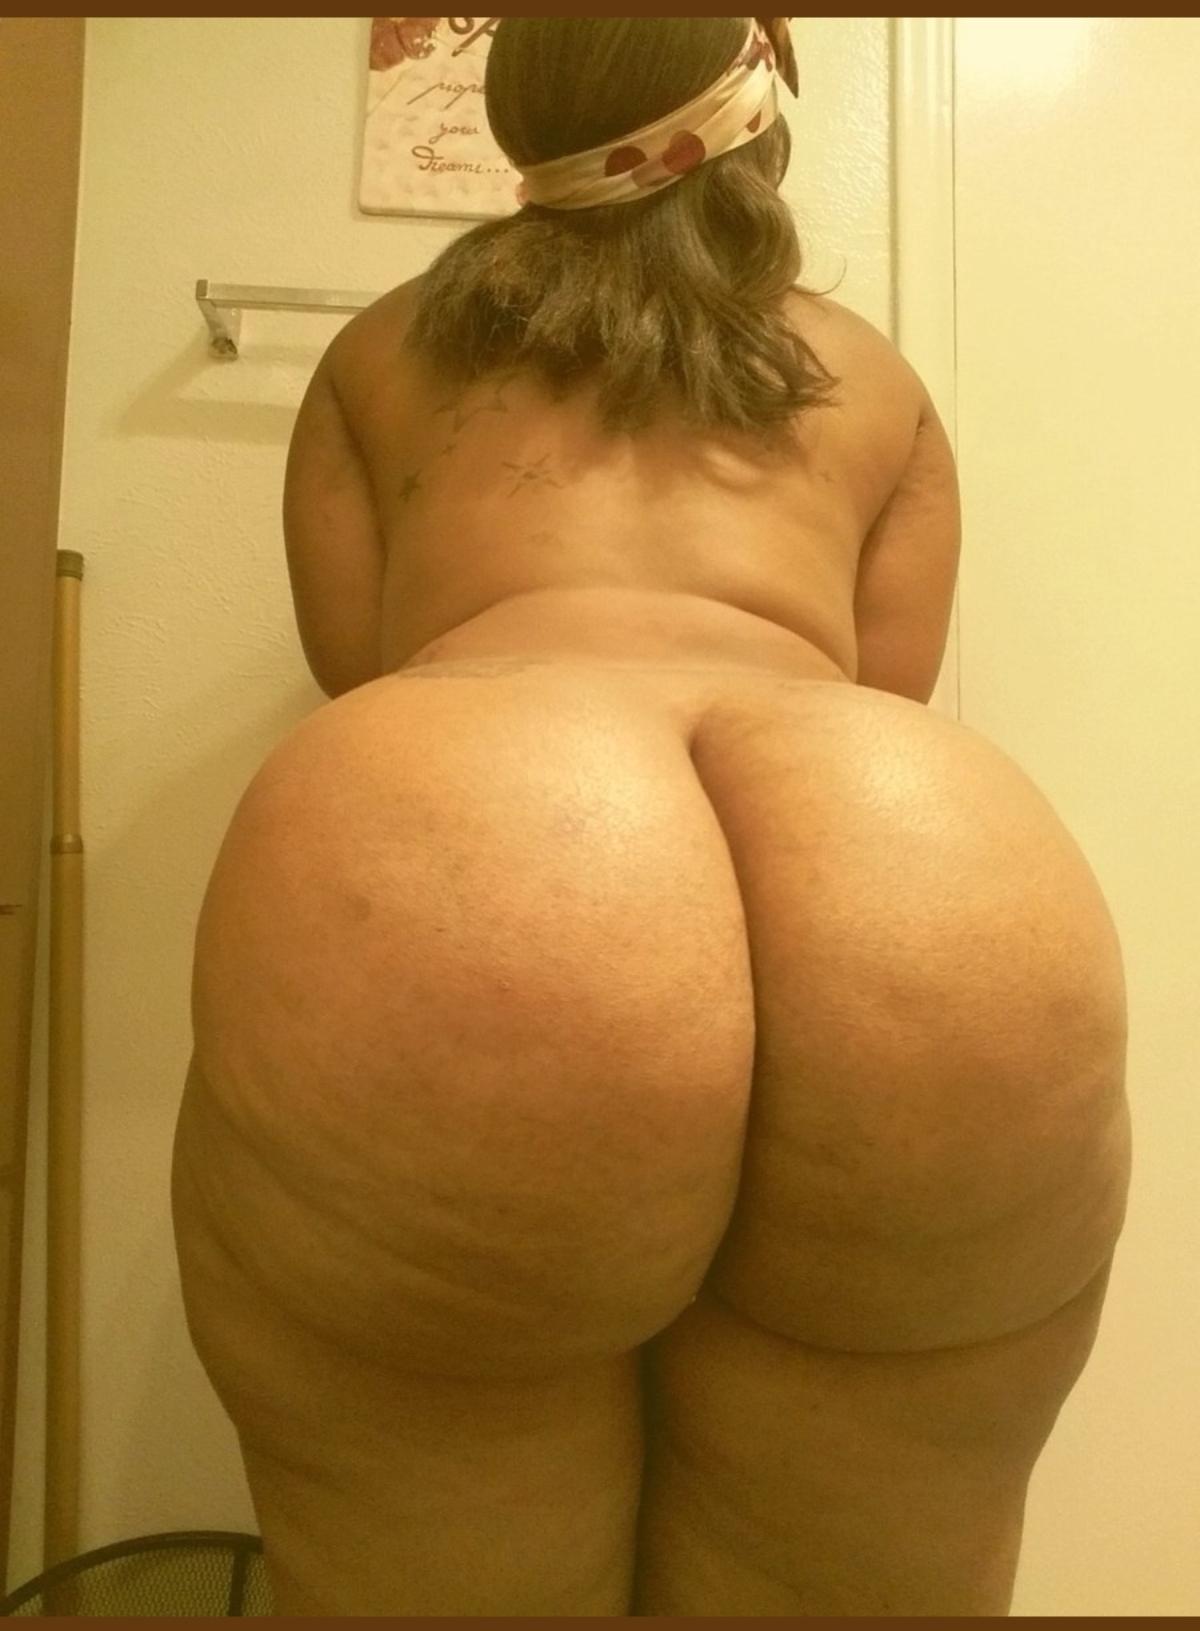 Latino juicy anal